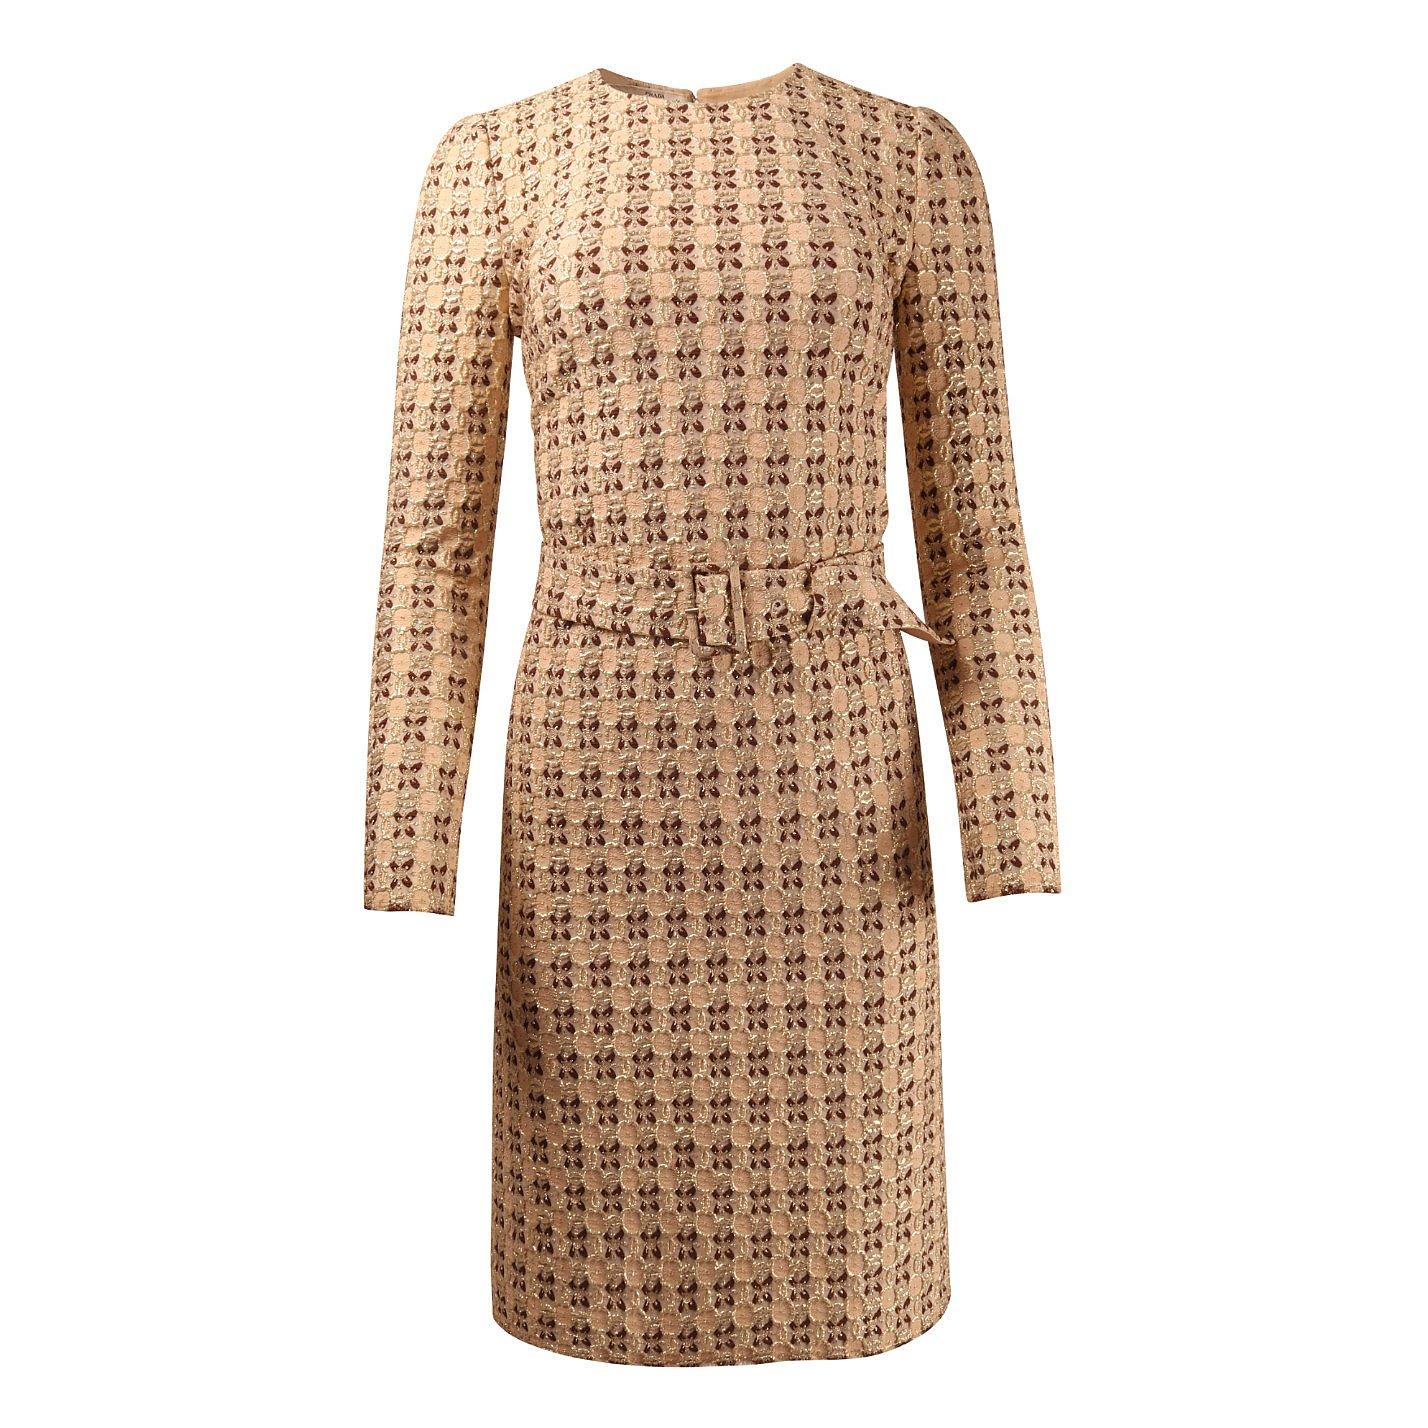 PRADA Metallic Woven Dress